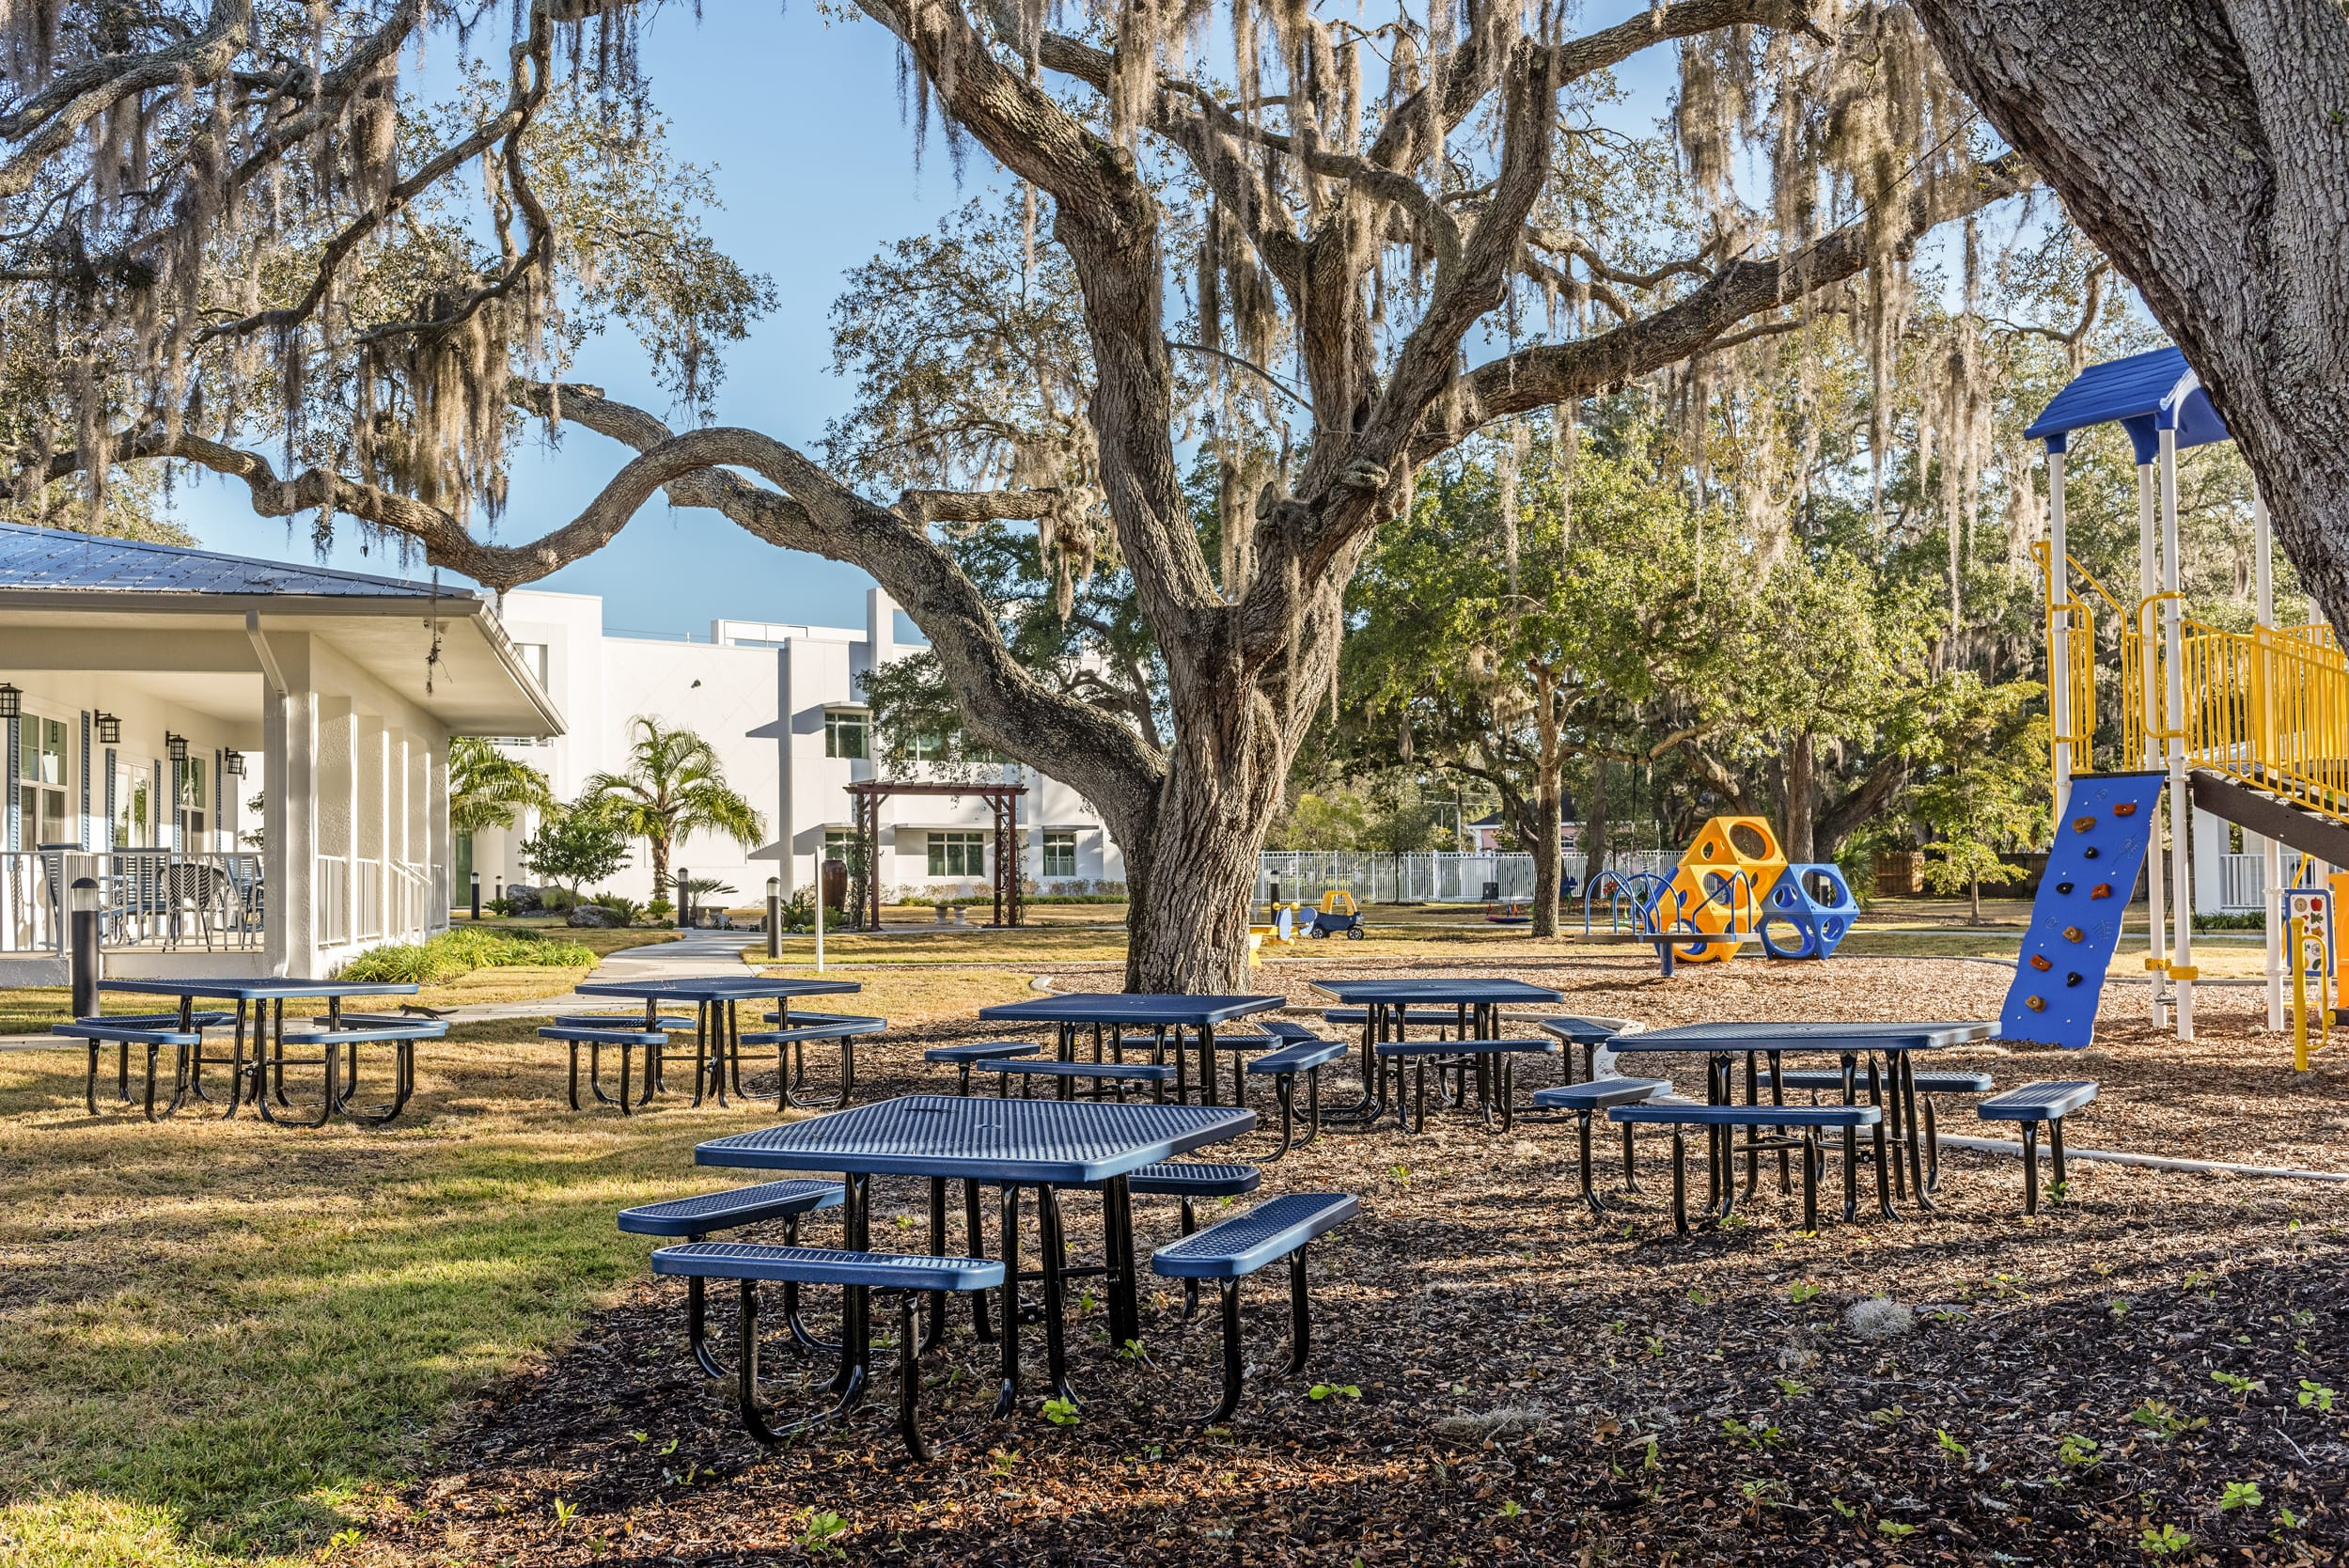 Picnic Tables Oak Tree Children's Play Area